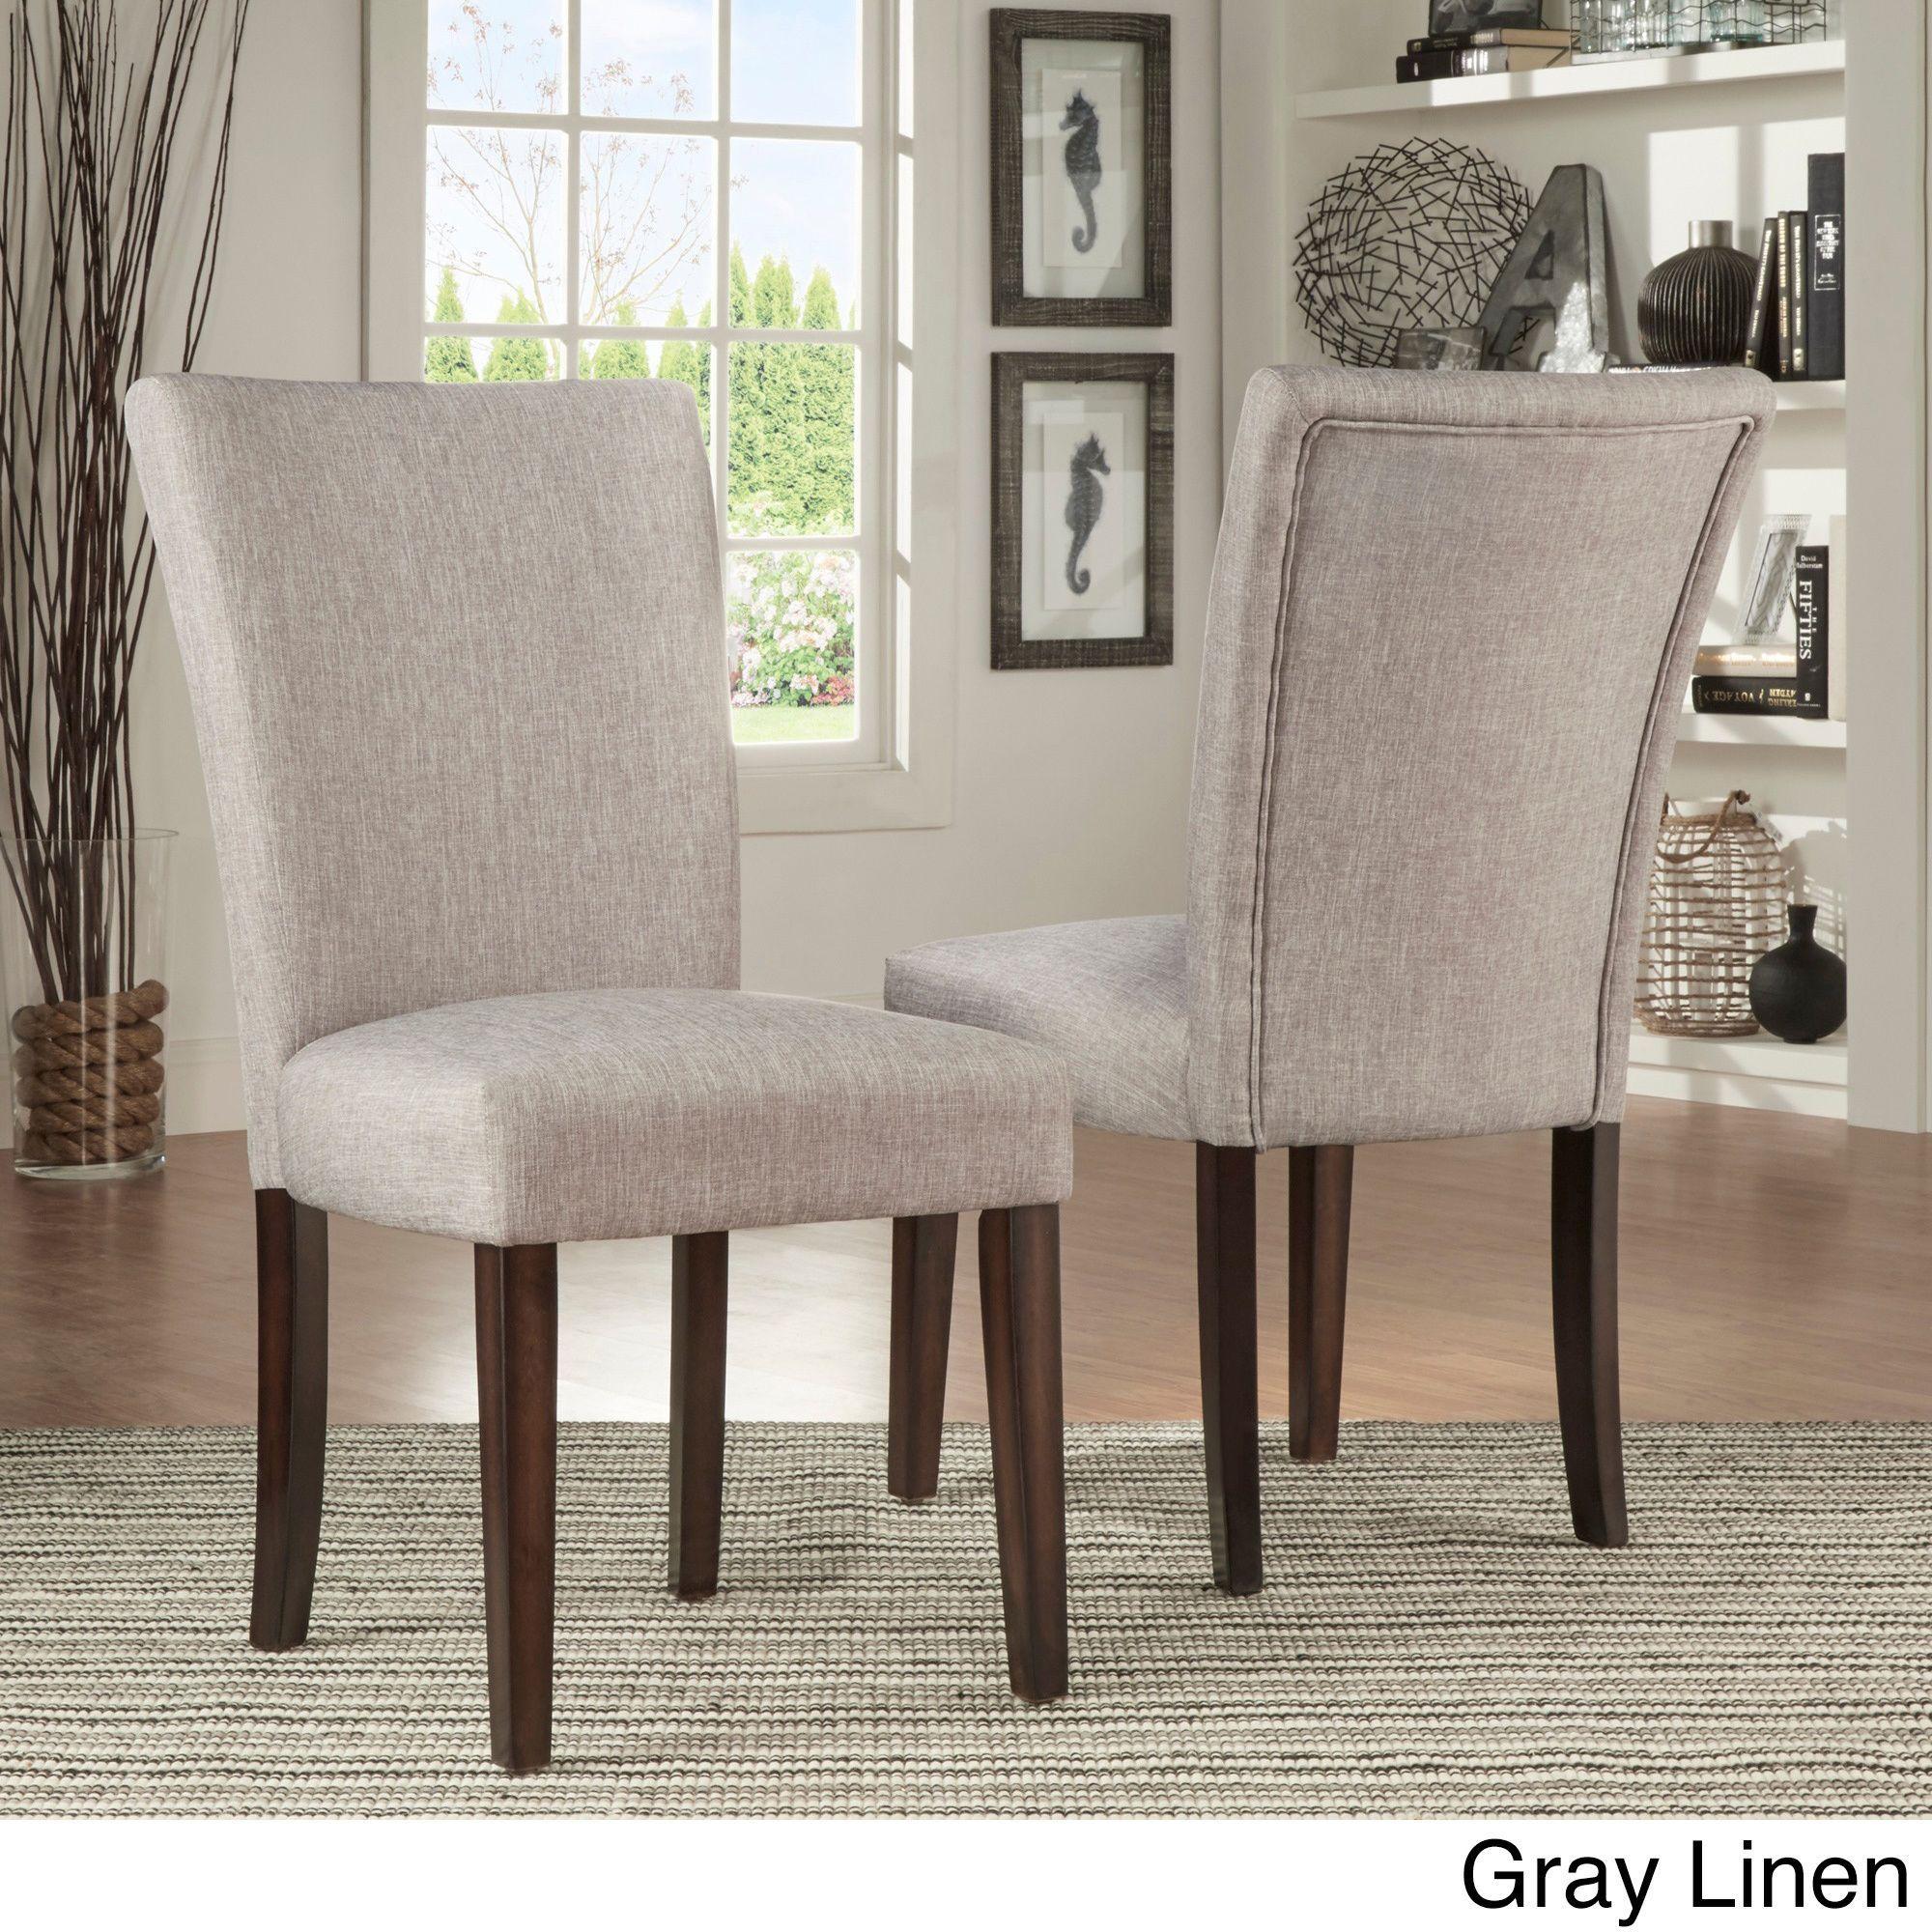 bedroom design wonderfull marvelous furniture decorating ideas interior and com home overstock simple cupboard creative